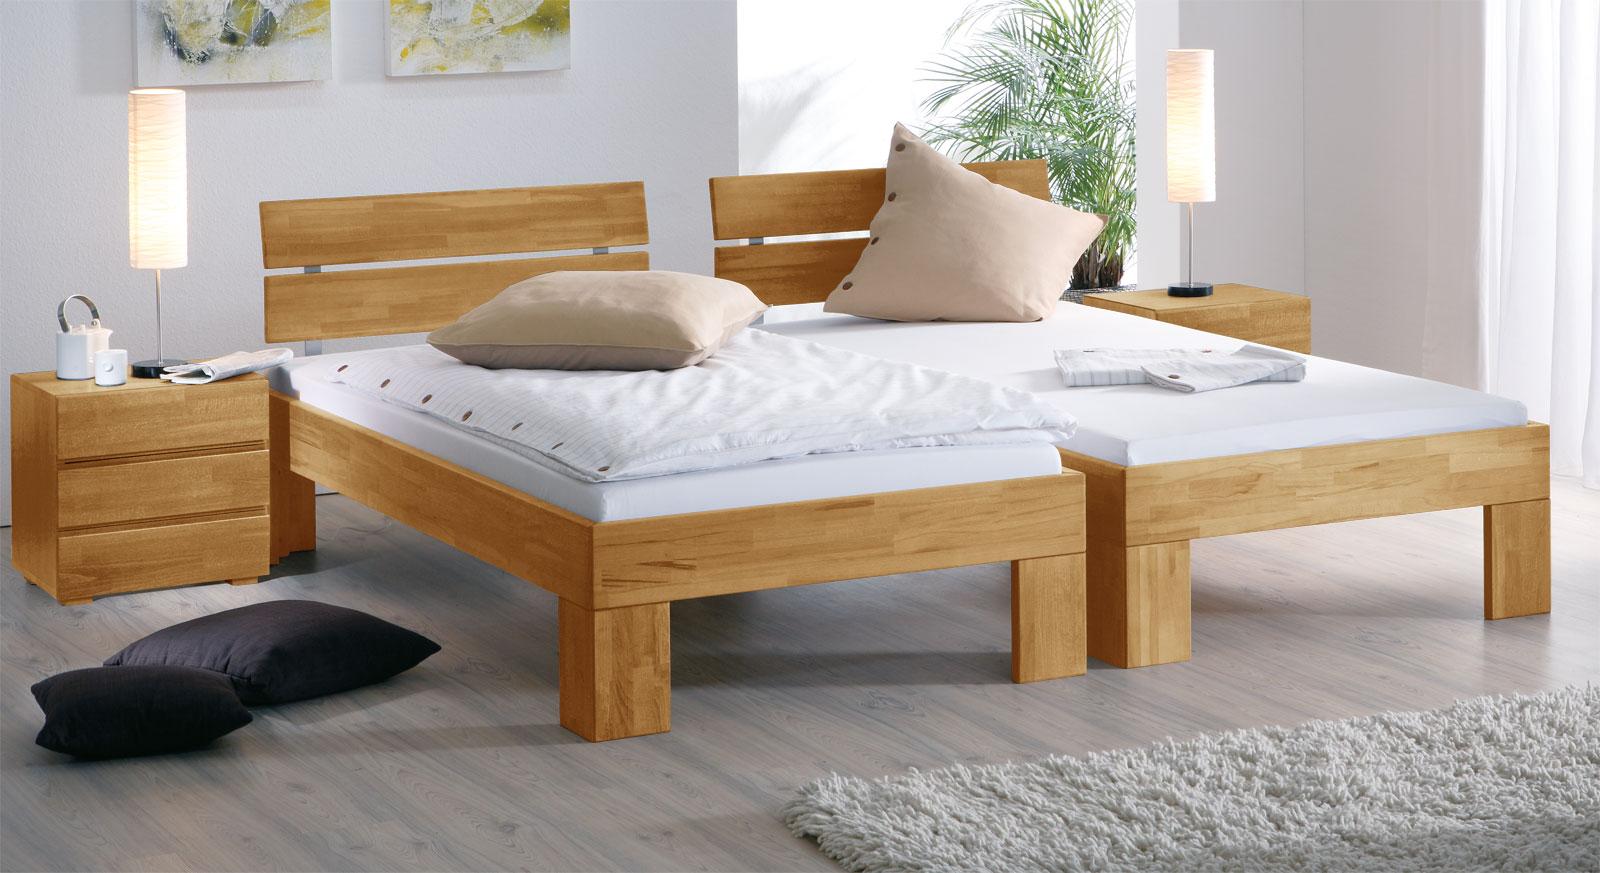 Natürliches Feeling mit naturfarbenem Massivholzbett aus Buche